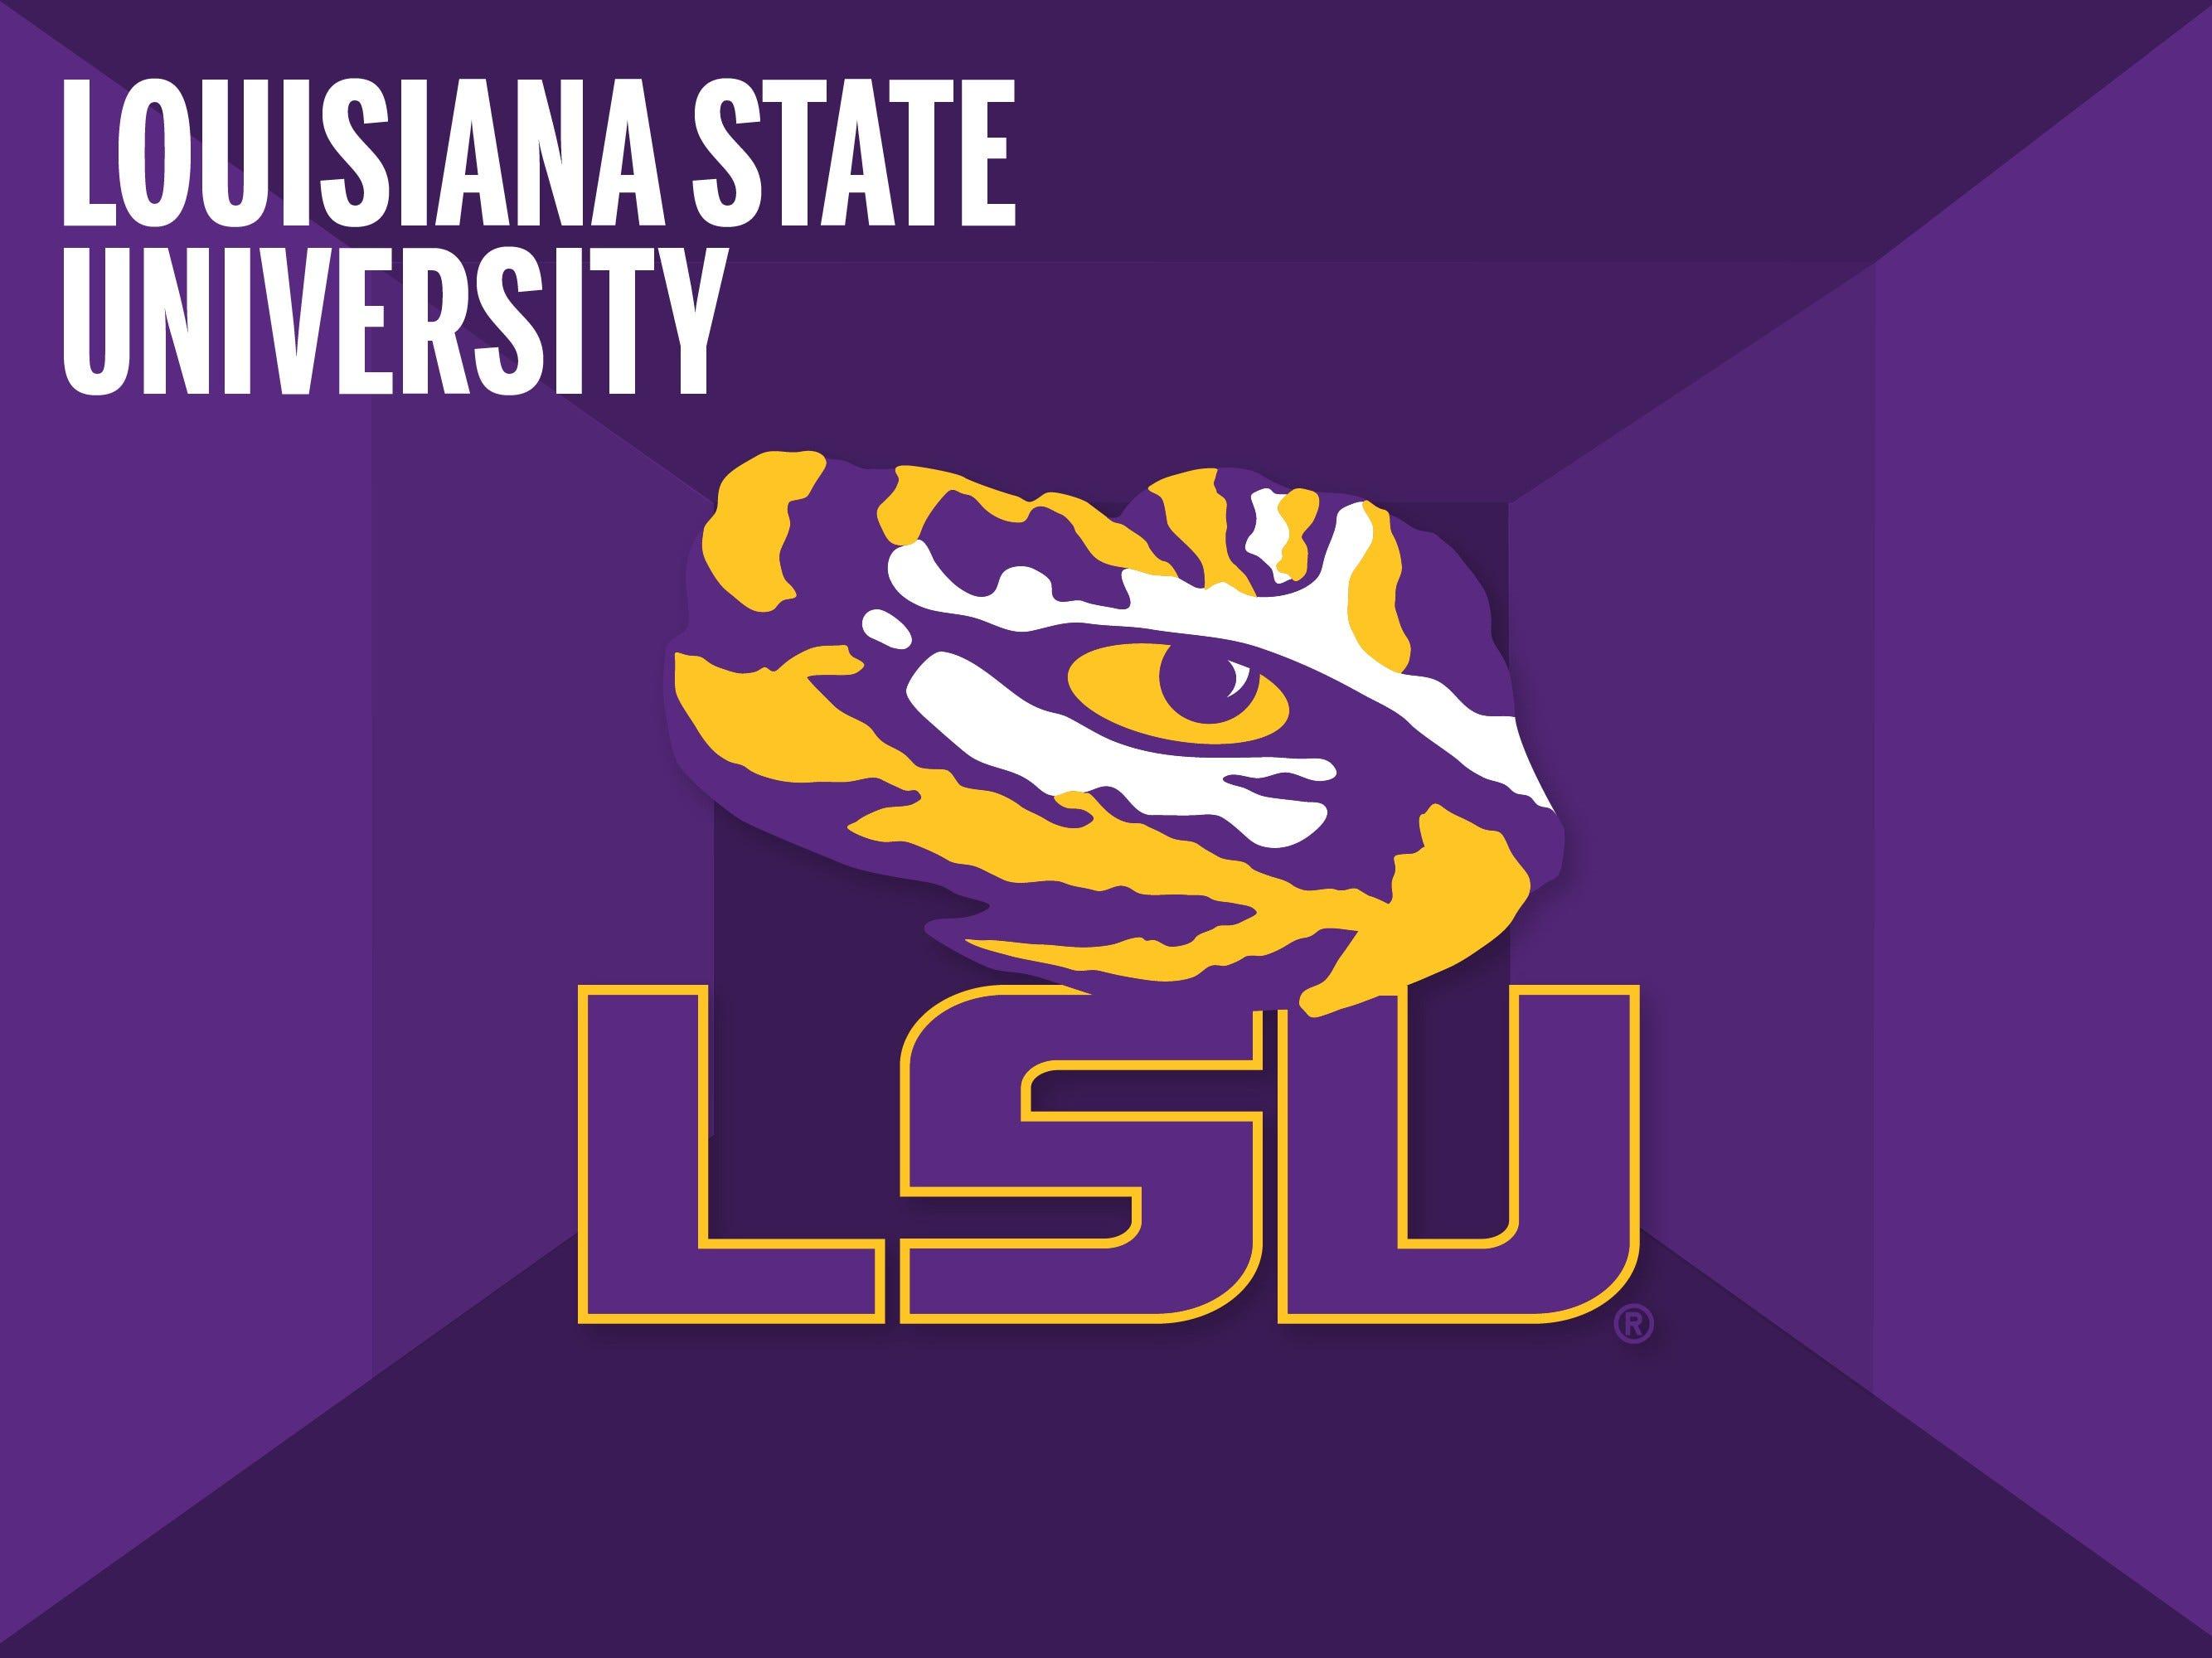 Louisiana State University College Football Shop